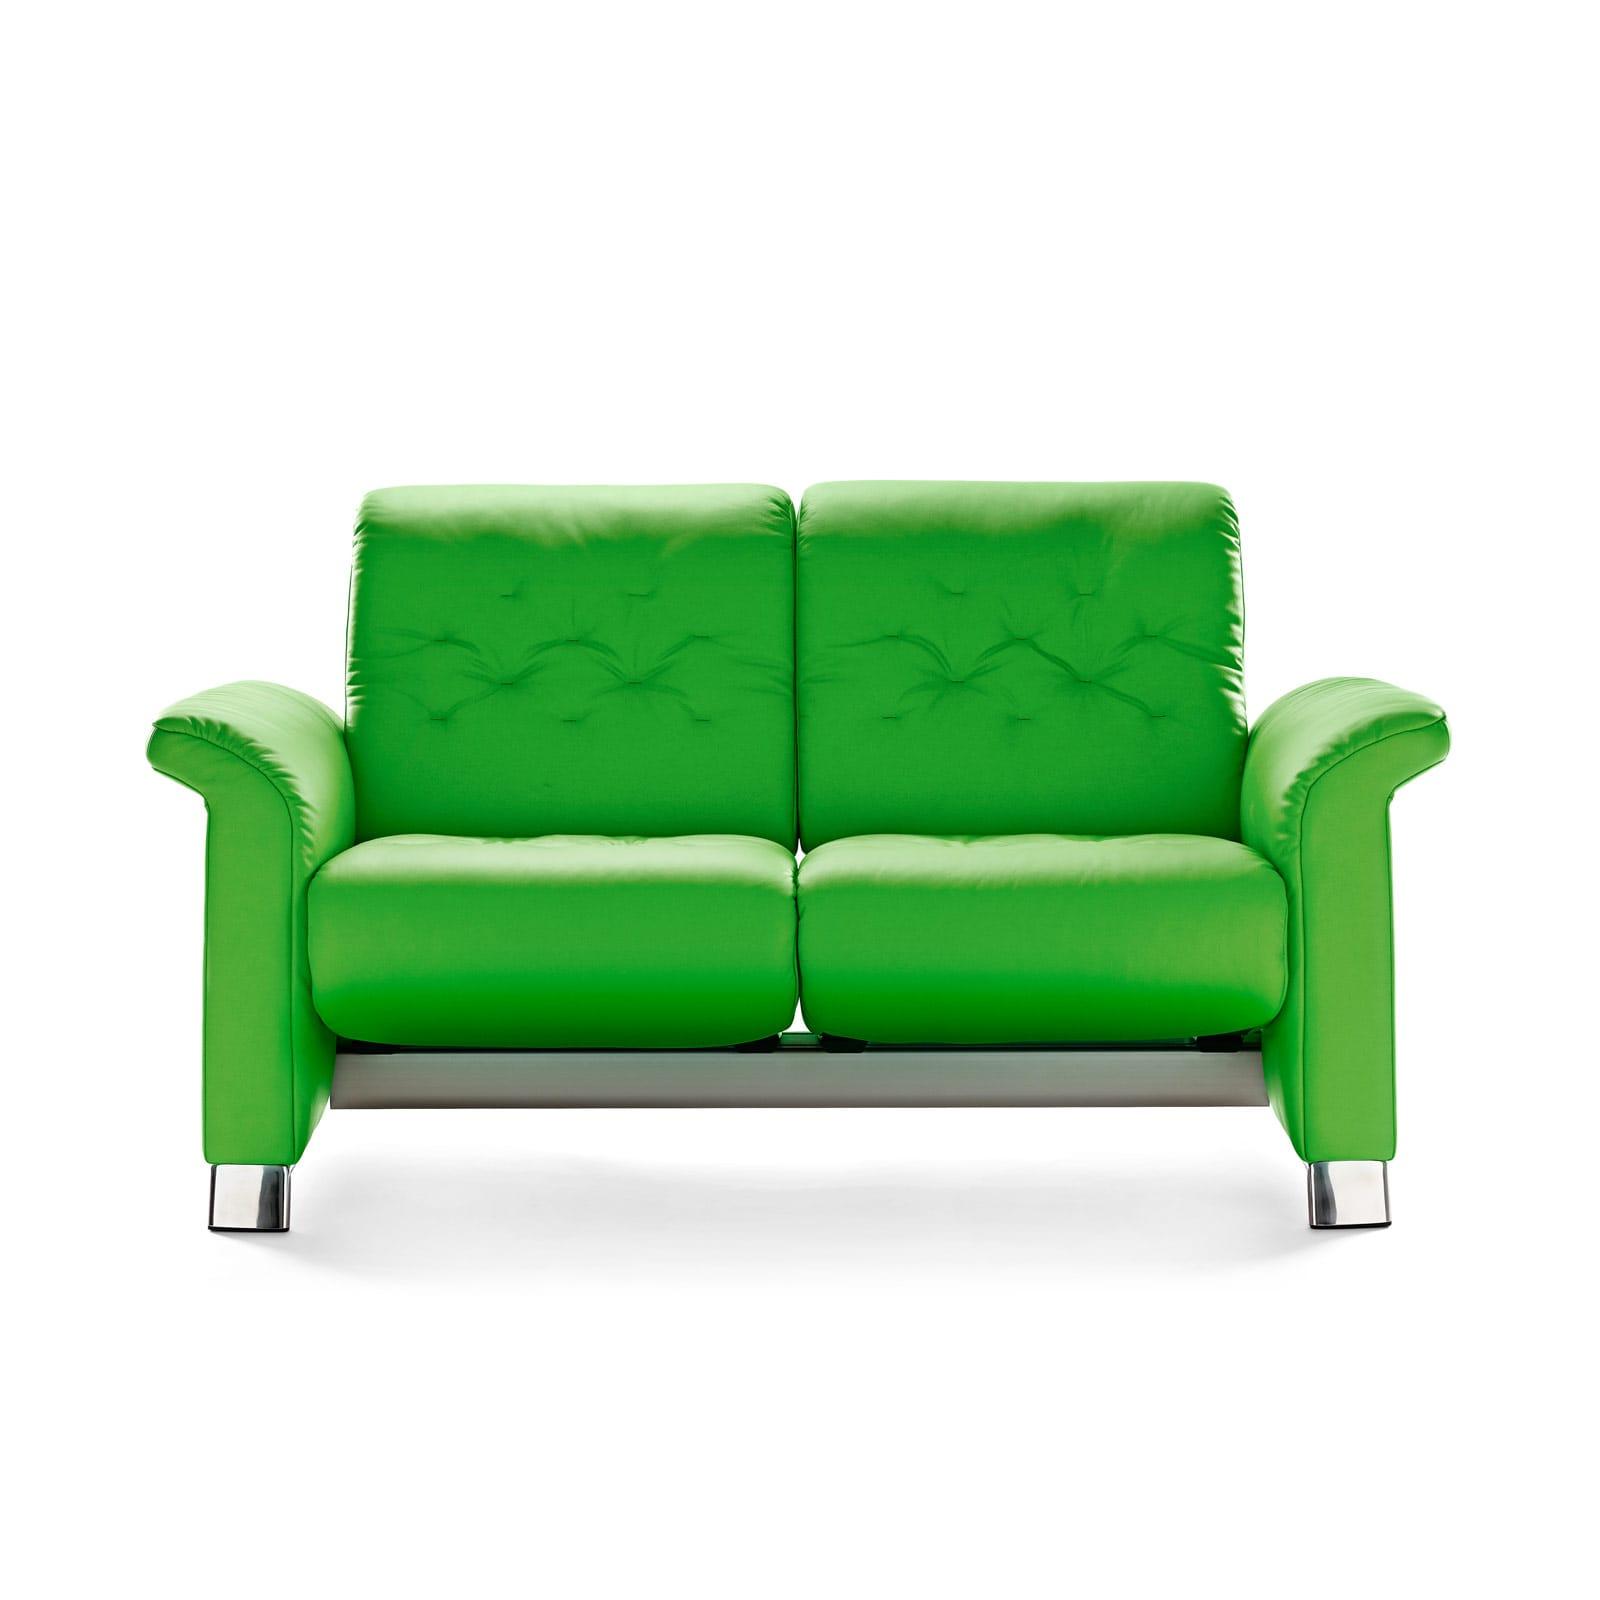 Stressless Sofa 2 Sitzer Metropolitan Paloma Summer Green